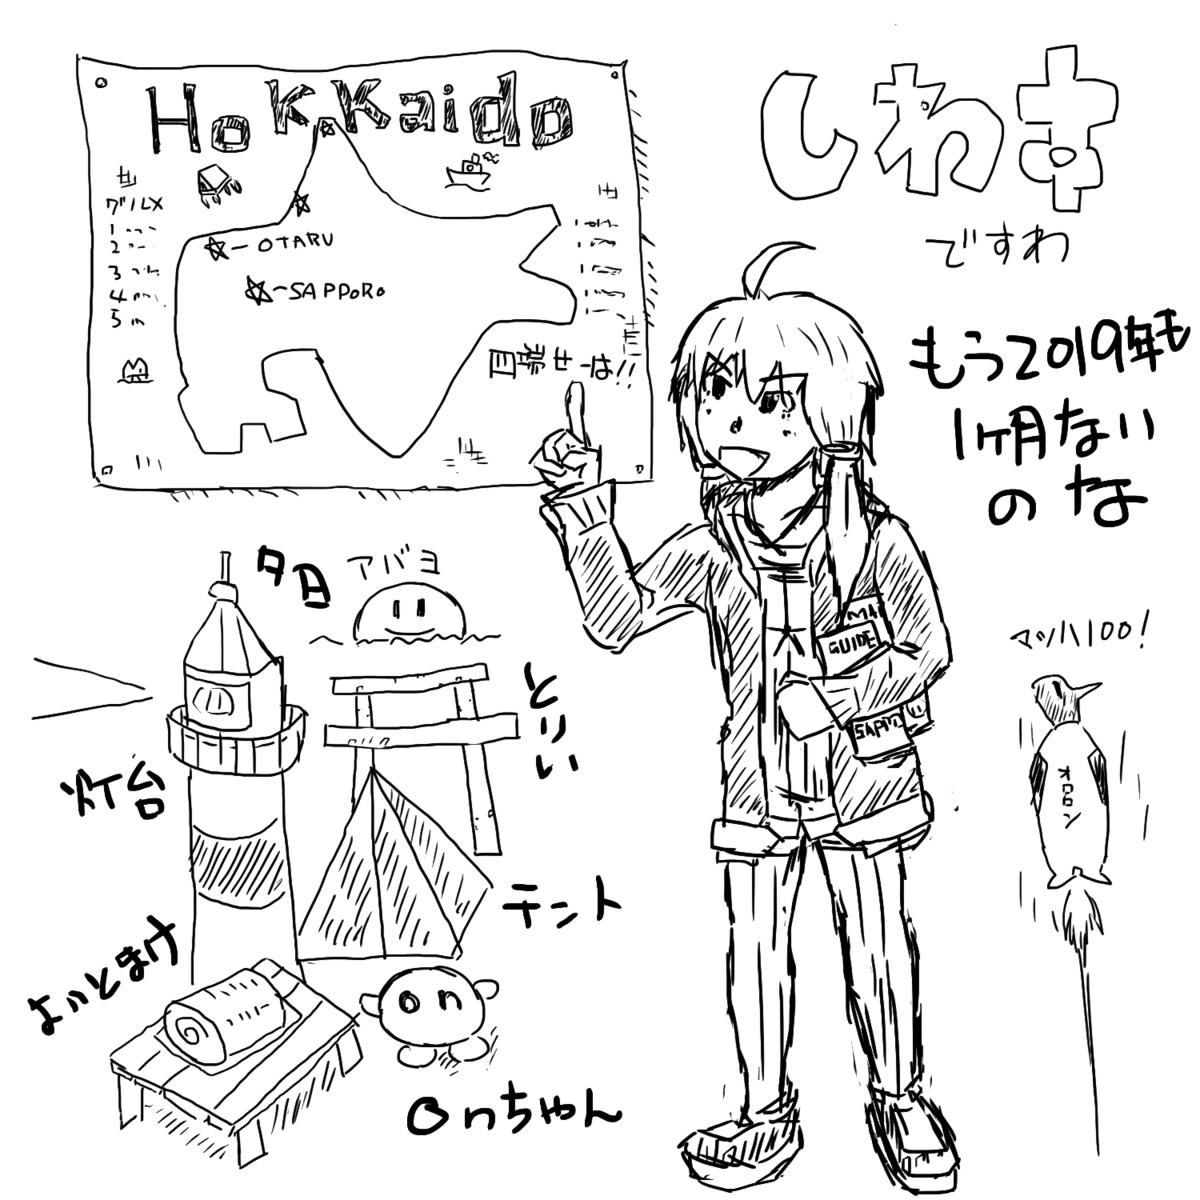 f:id:zomuzomu:20191212115704p:plain